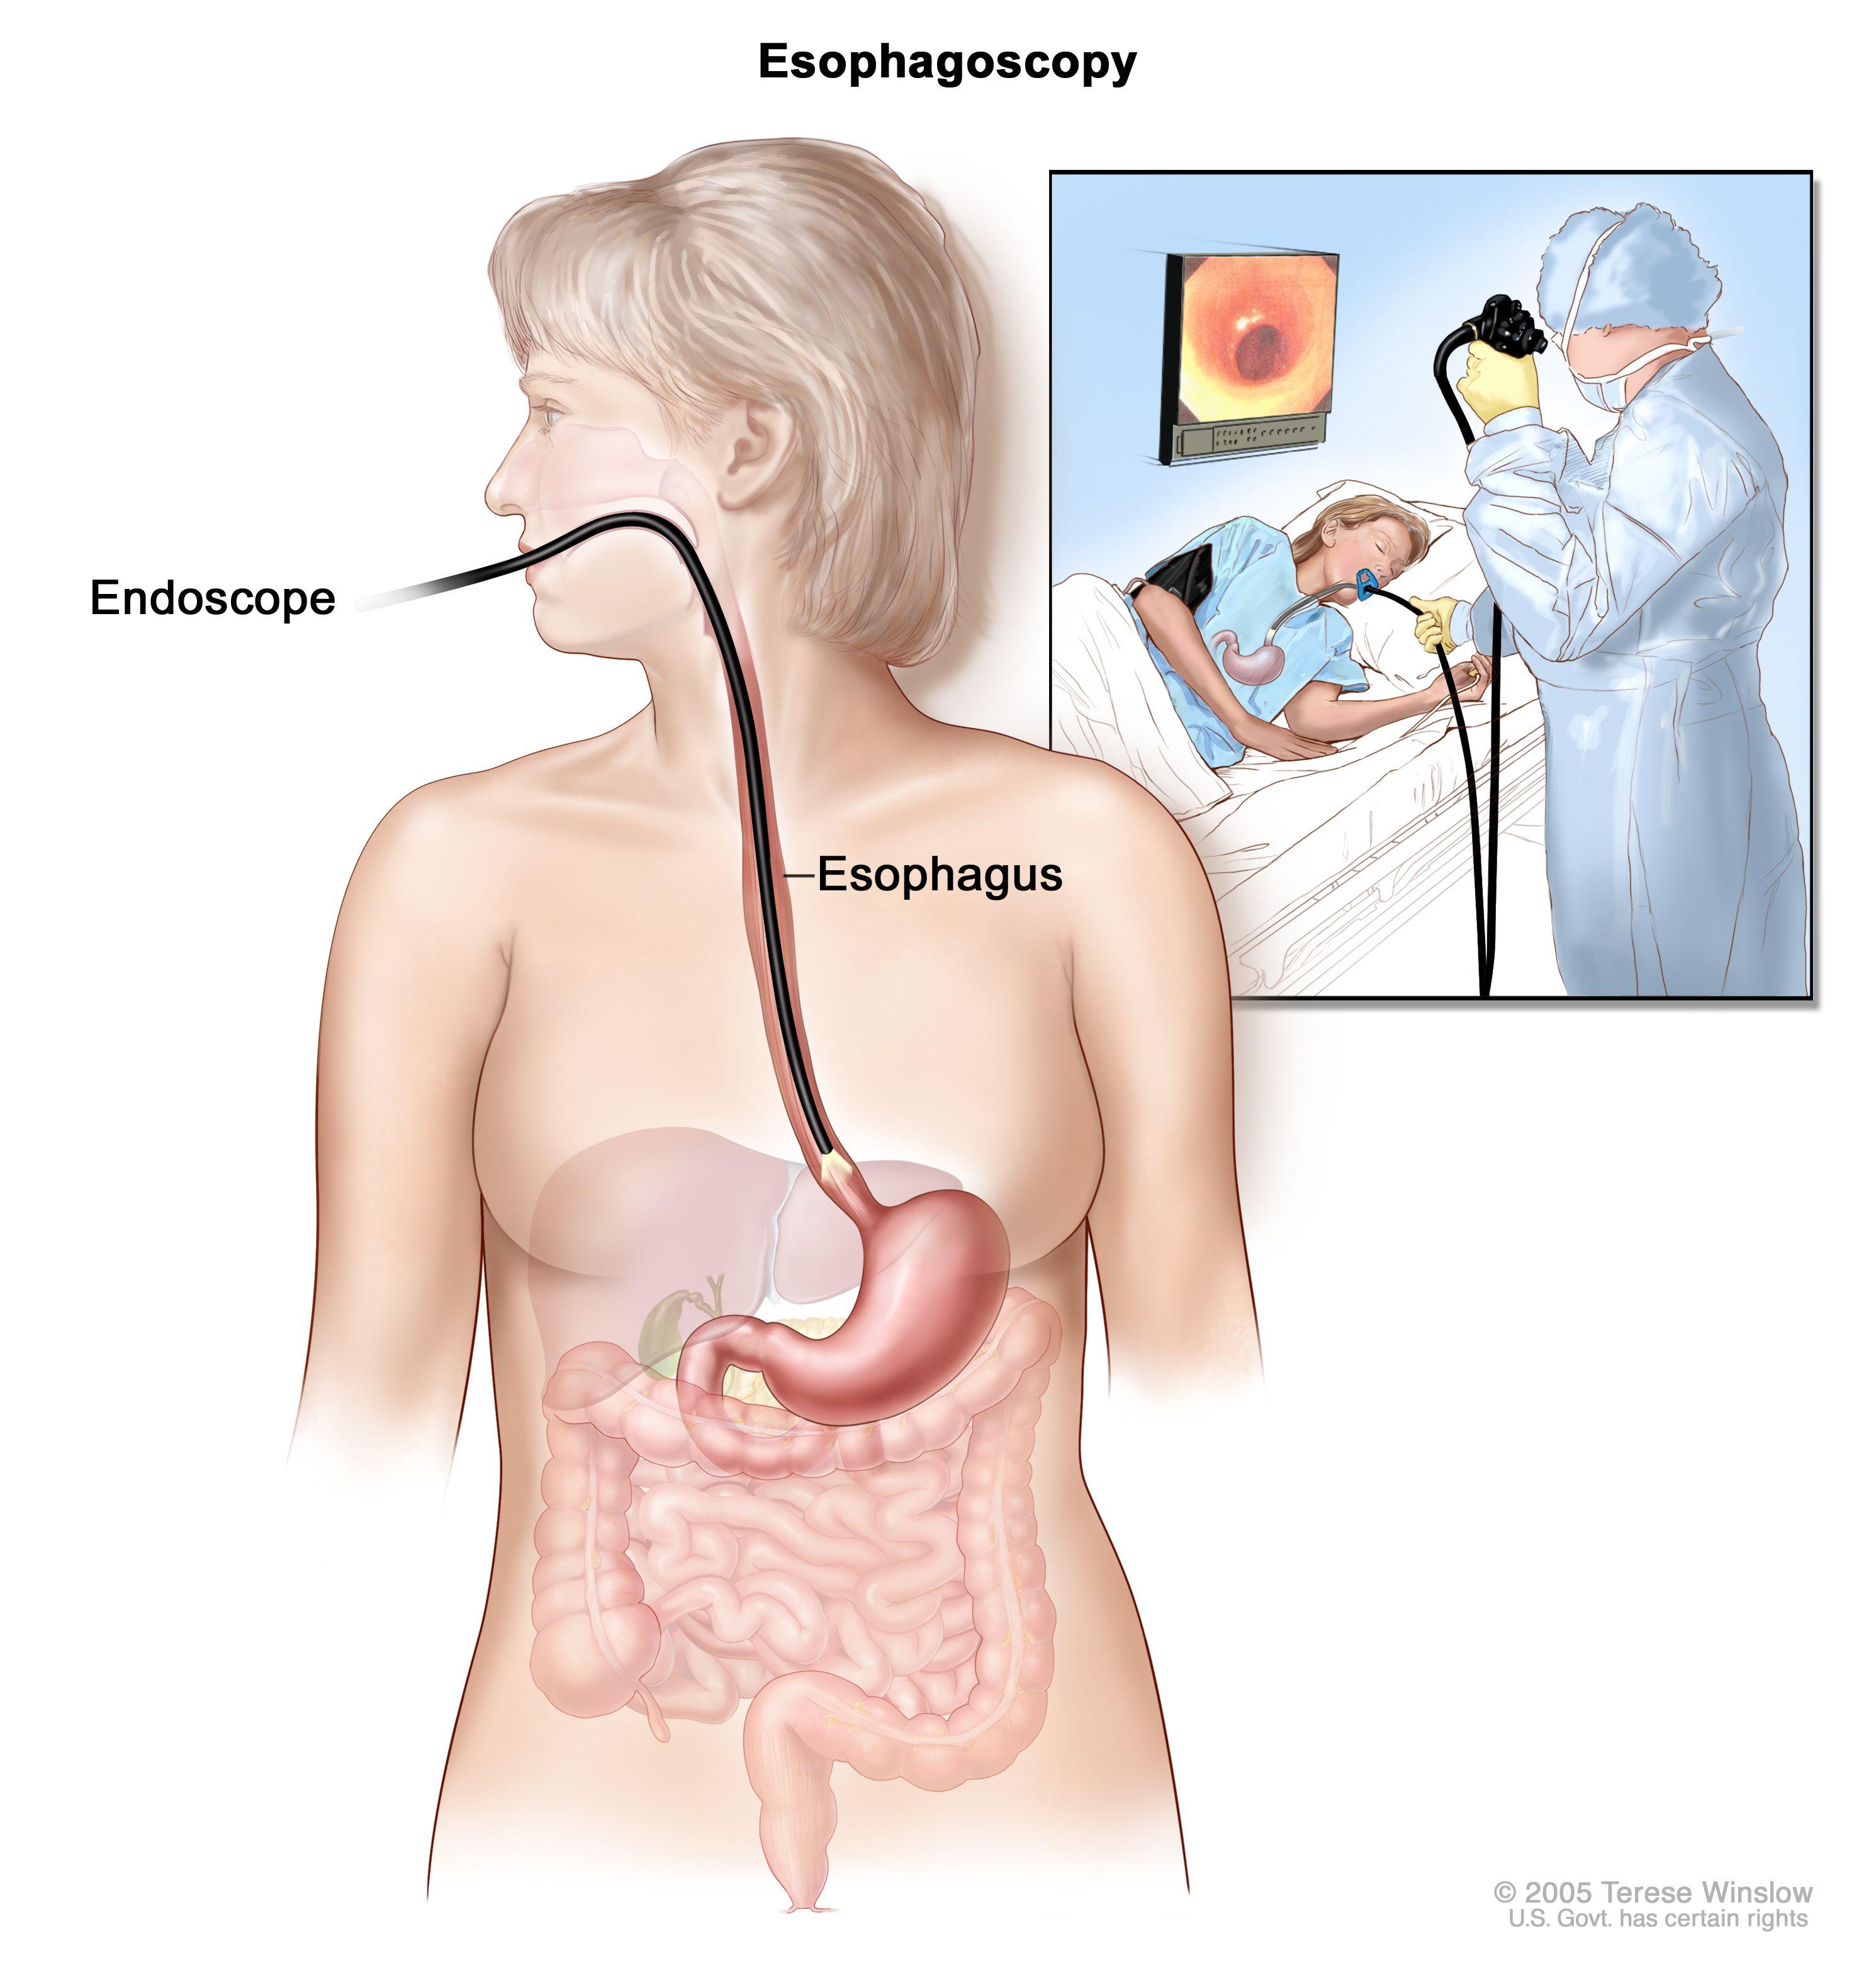 metastatic cancer esophageal papillomavirus oncogene definition